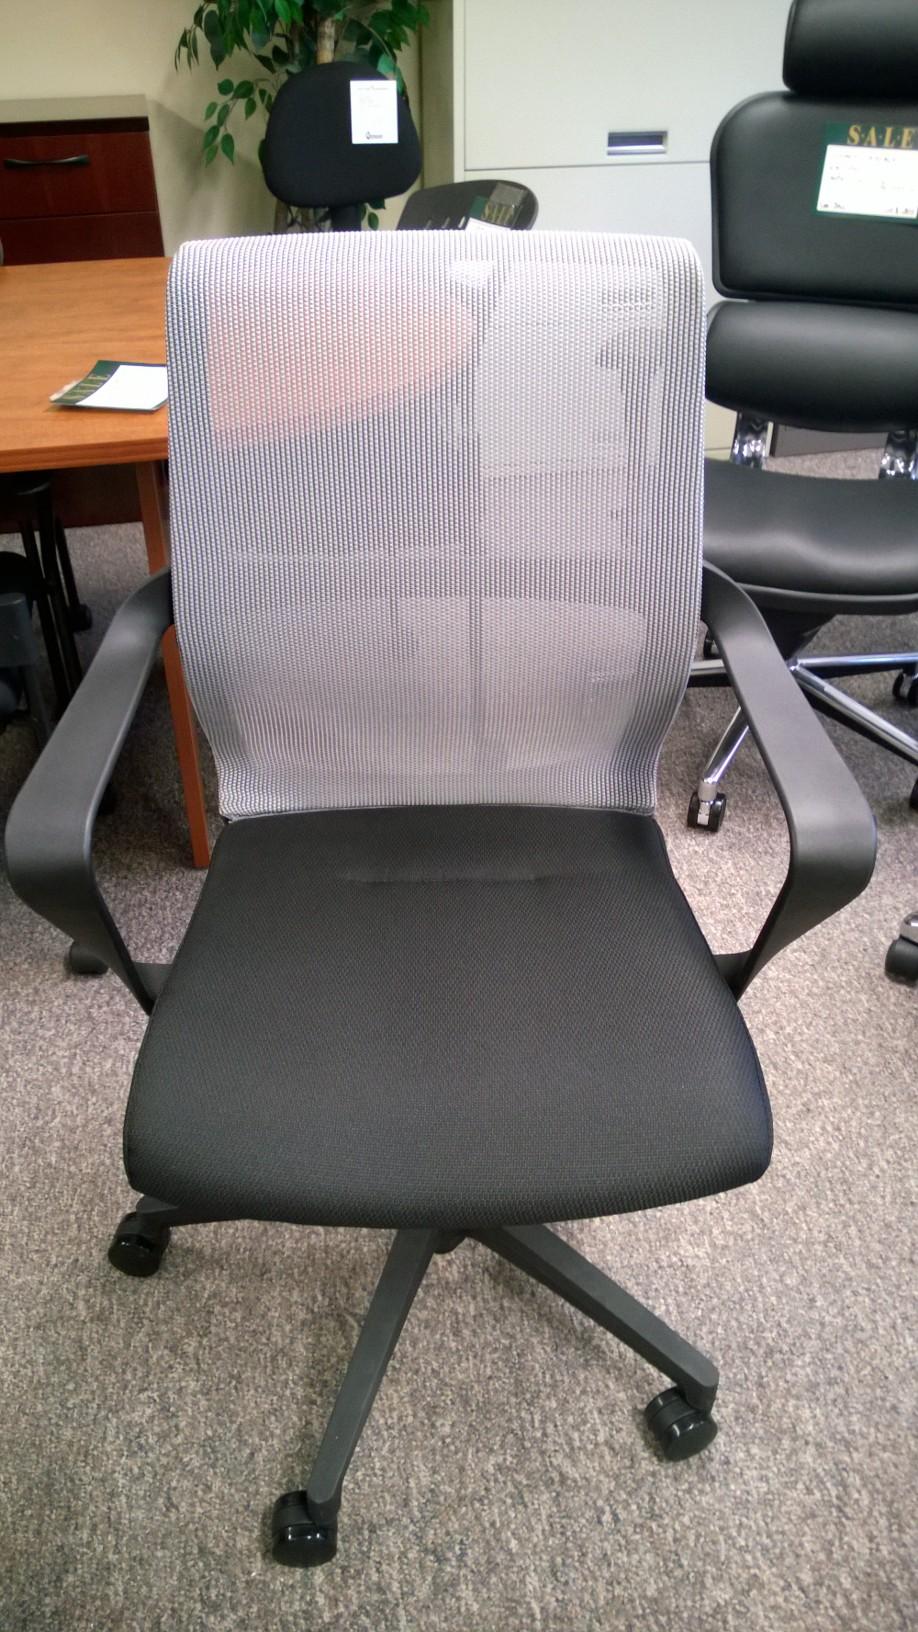 chairs woodstock ravi chair